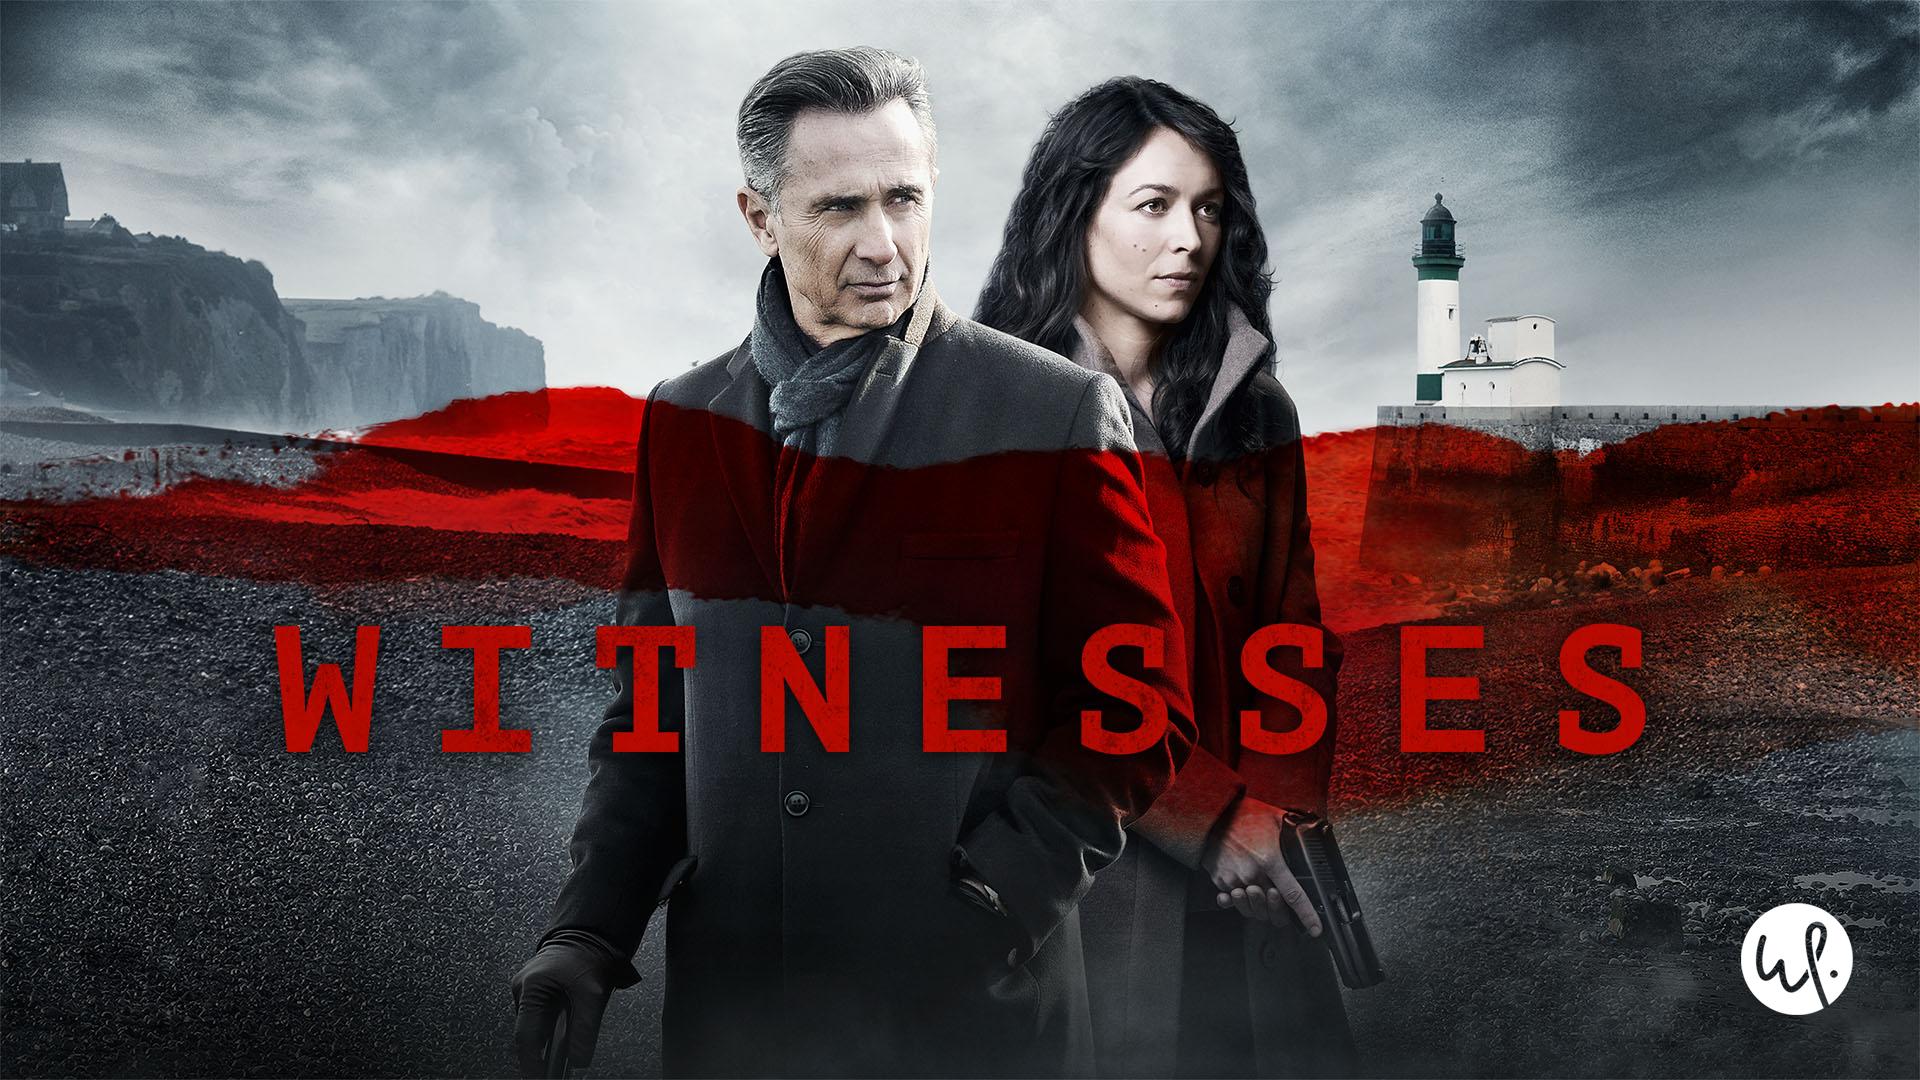 Witnesses, Season 1